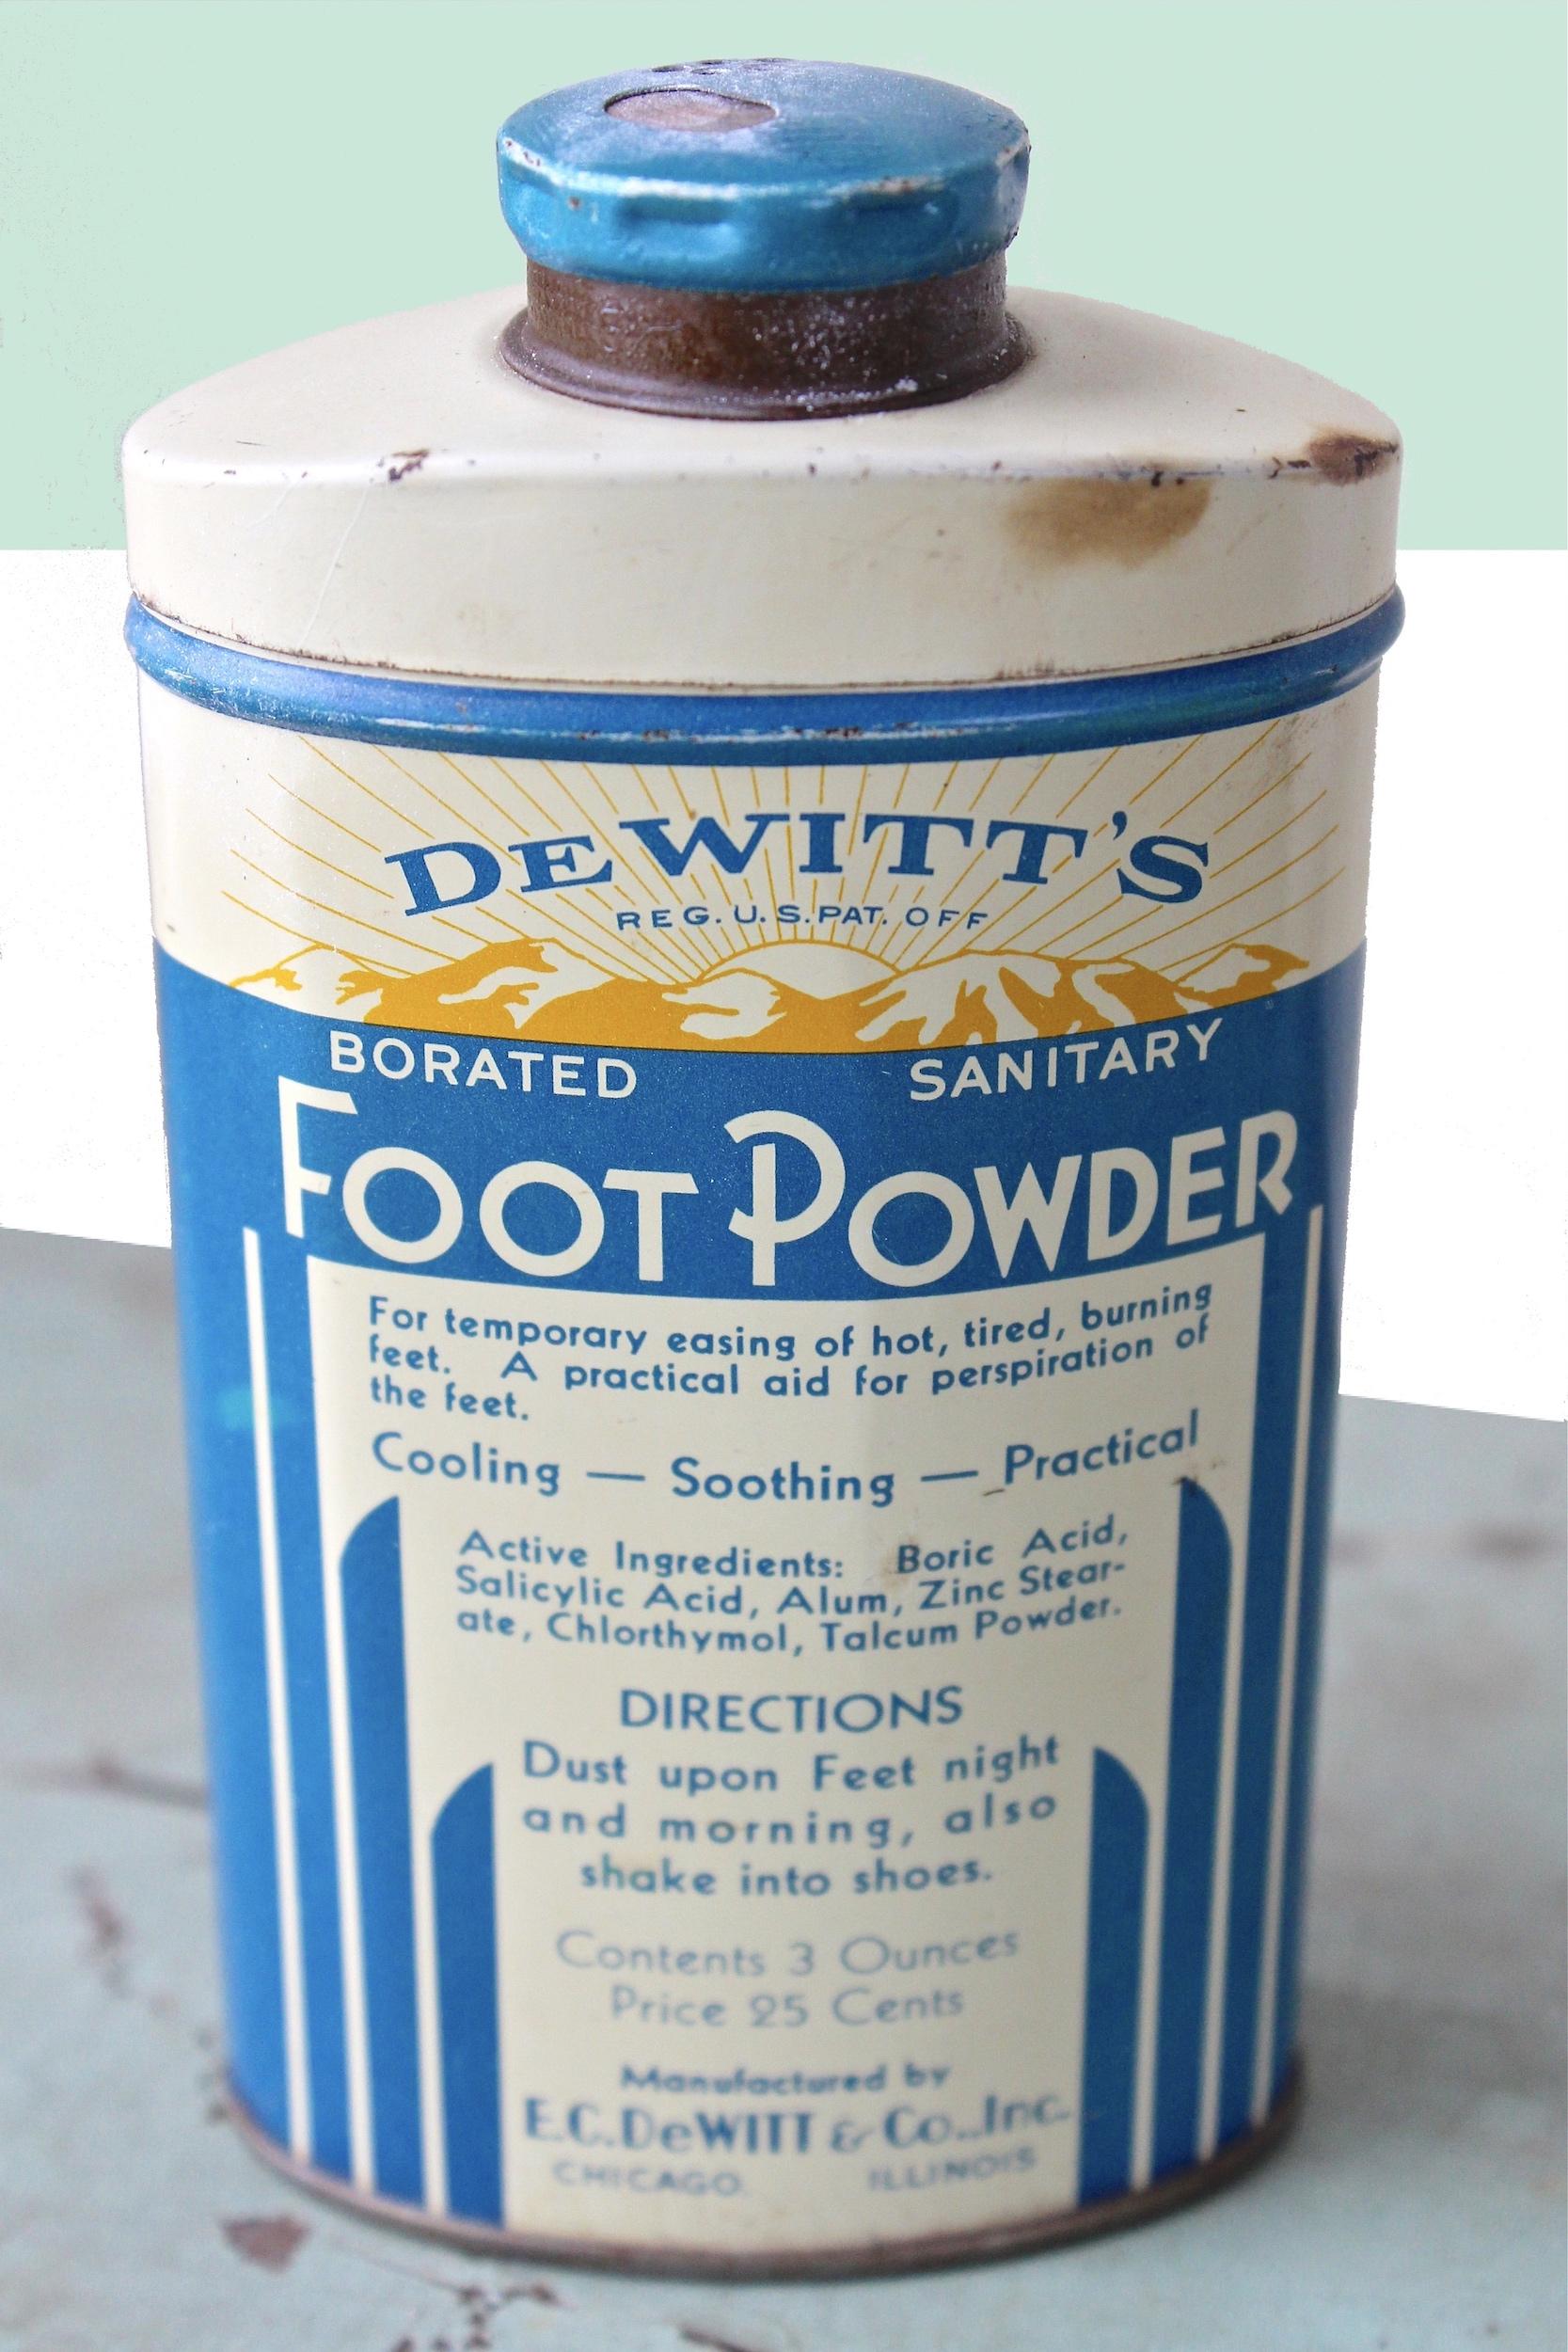 DeWitt's Foot Powder